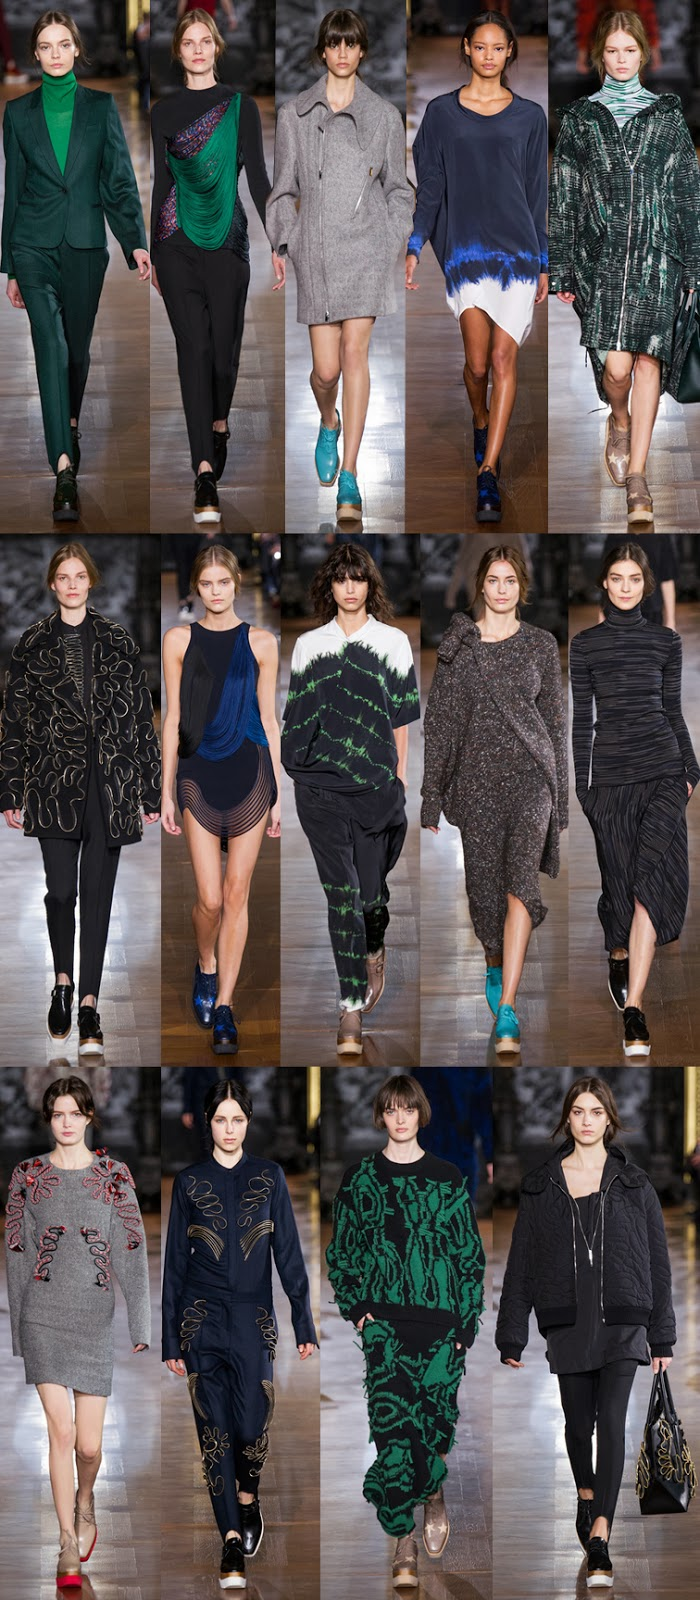 Stella McCartney fall winter 2014 runway collection, PFW, Paris fashion week, FW14, AW14